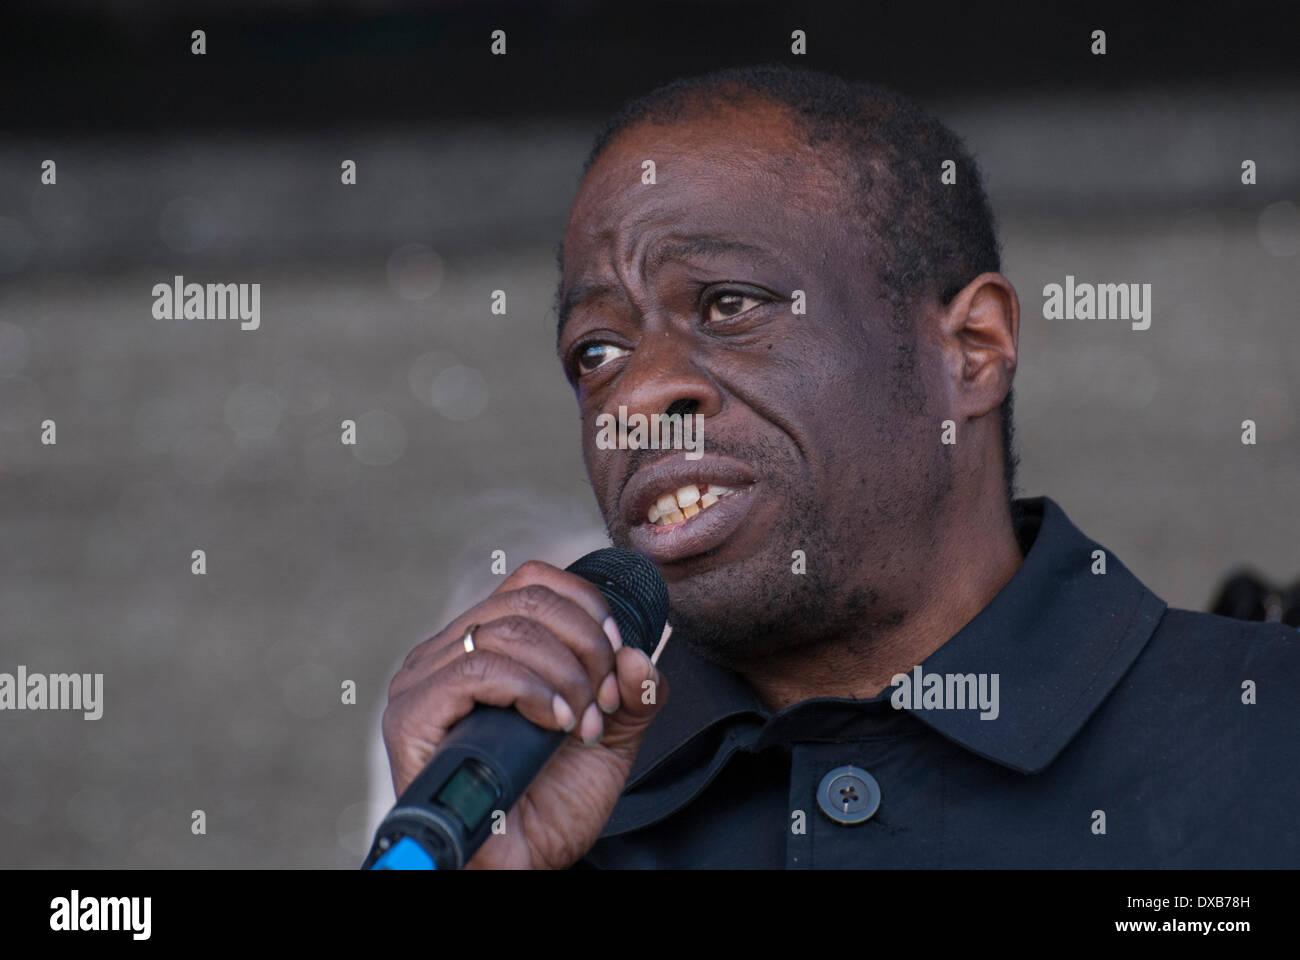 London, UK. 22nd March 2014. Unite Against Fascism Joint secretary Weyman Bennett addresses the Anti-Racism rally in London's Trafalgar Square. Credit:  Peter Manning/Alamy Live News - Stock Image